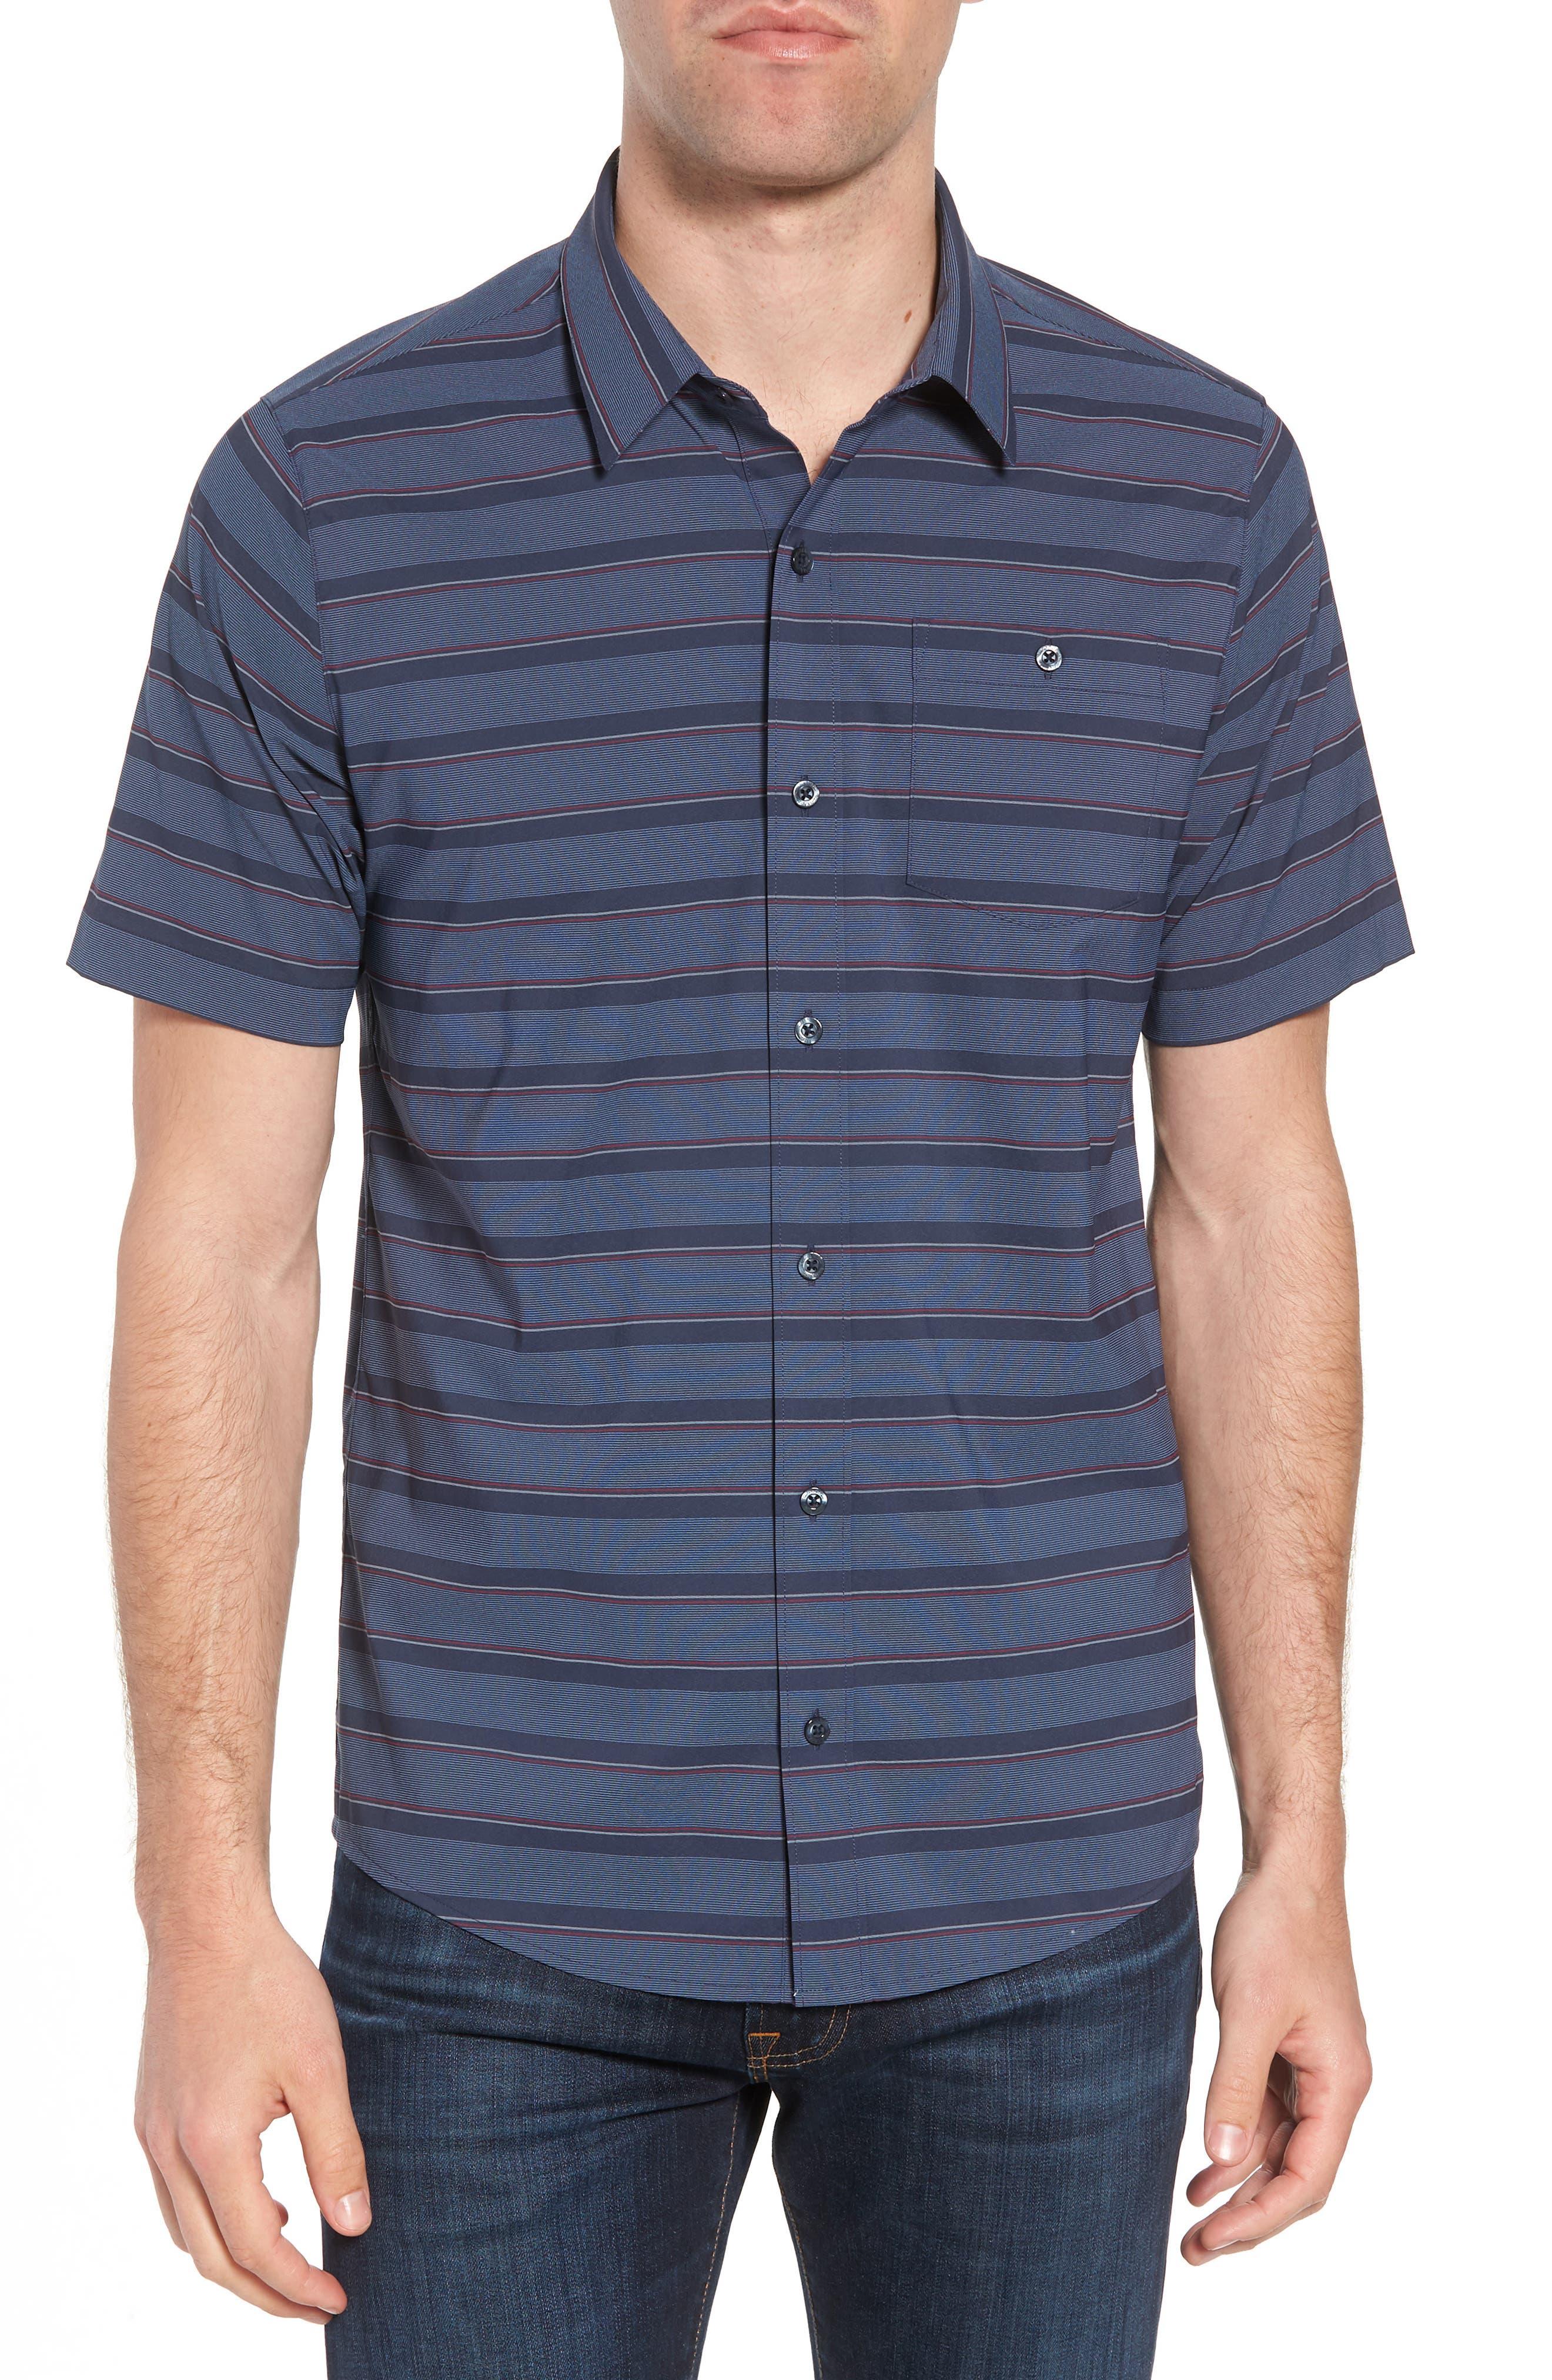 Quiver Regular Fit Sport Shirt,                             Main thumbnail 1, color,                             Blue Nights